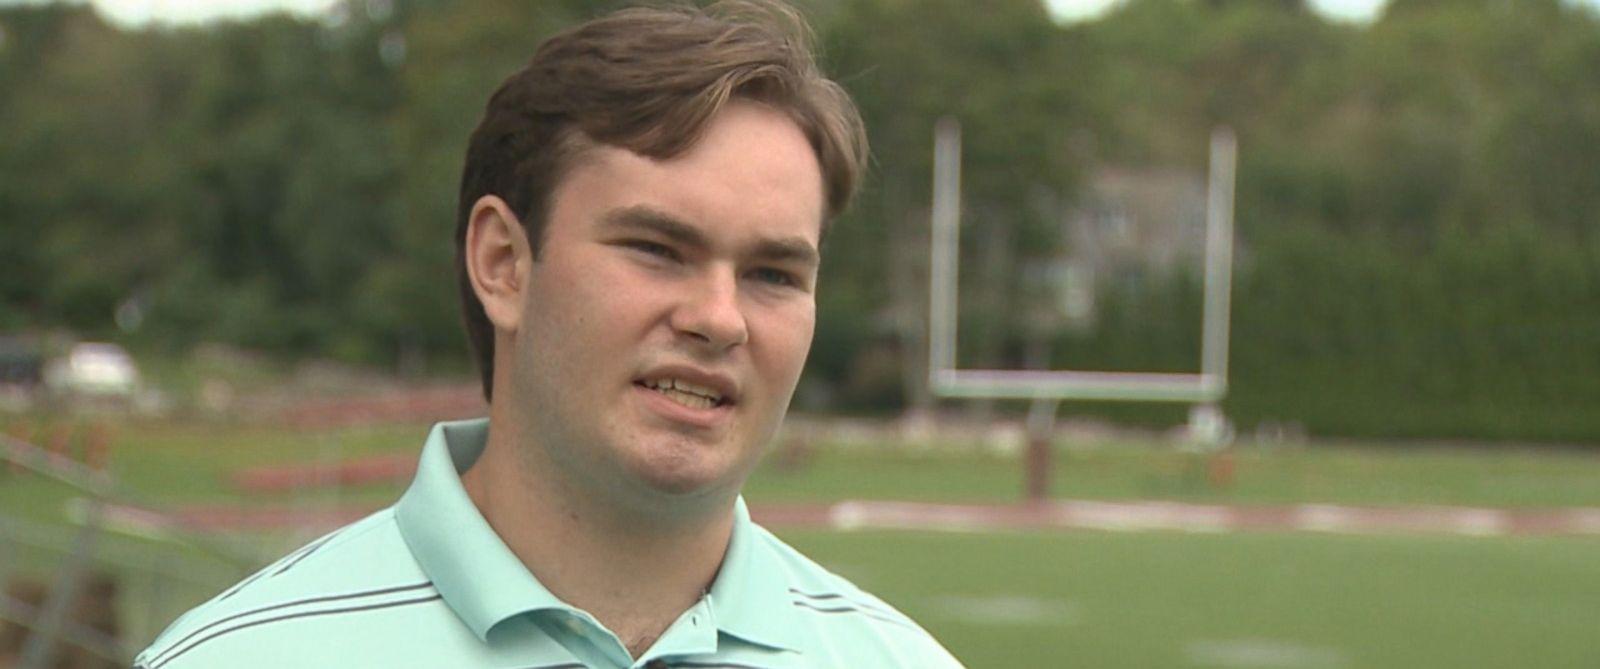 PHOTO: High school senior Paul Houle Jr. credits his Apple Watch with saving his life.